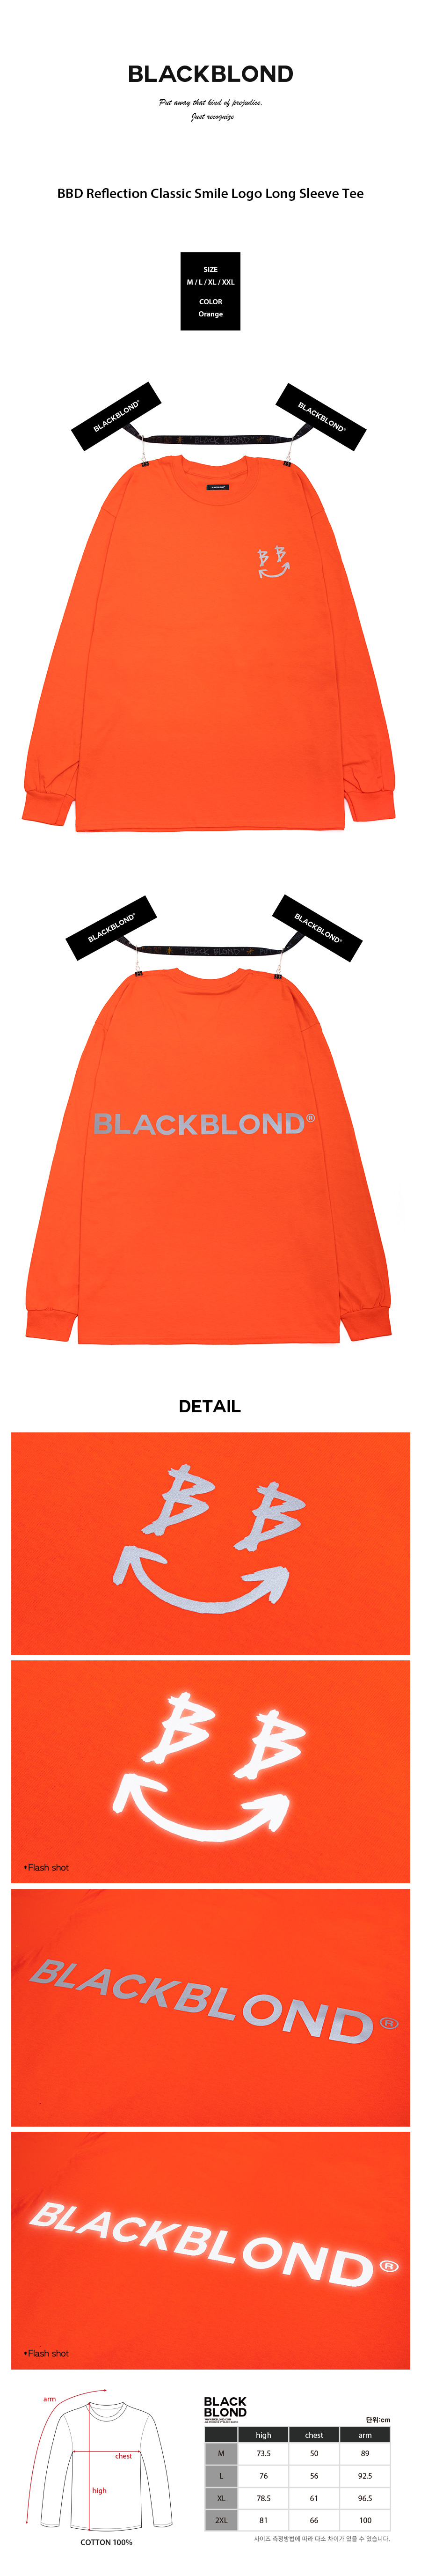 BLACKBLOND - BBD Reflection Classic Smile Logo Long Sleeve Tee (Orange)